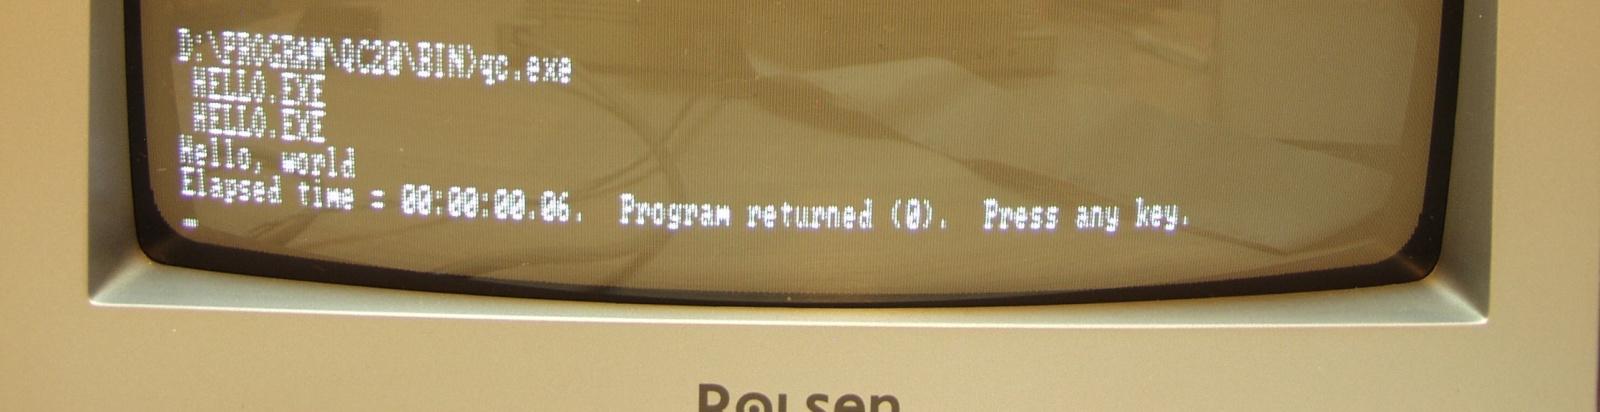 Итальянская IBM-PC Olivetti Prodest PC1 HD - 19